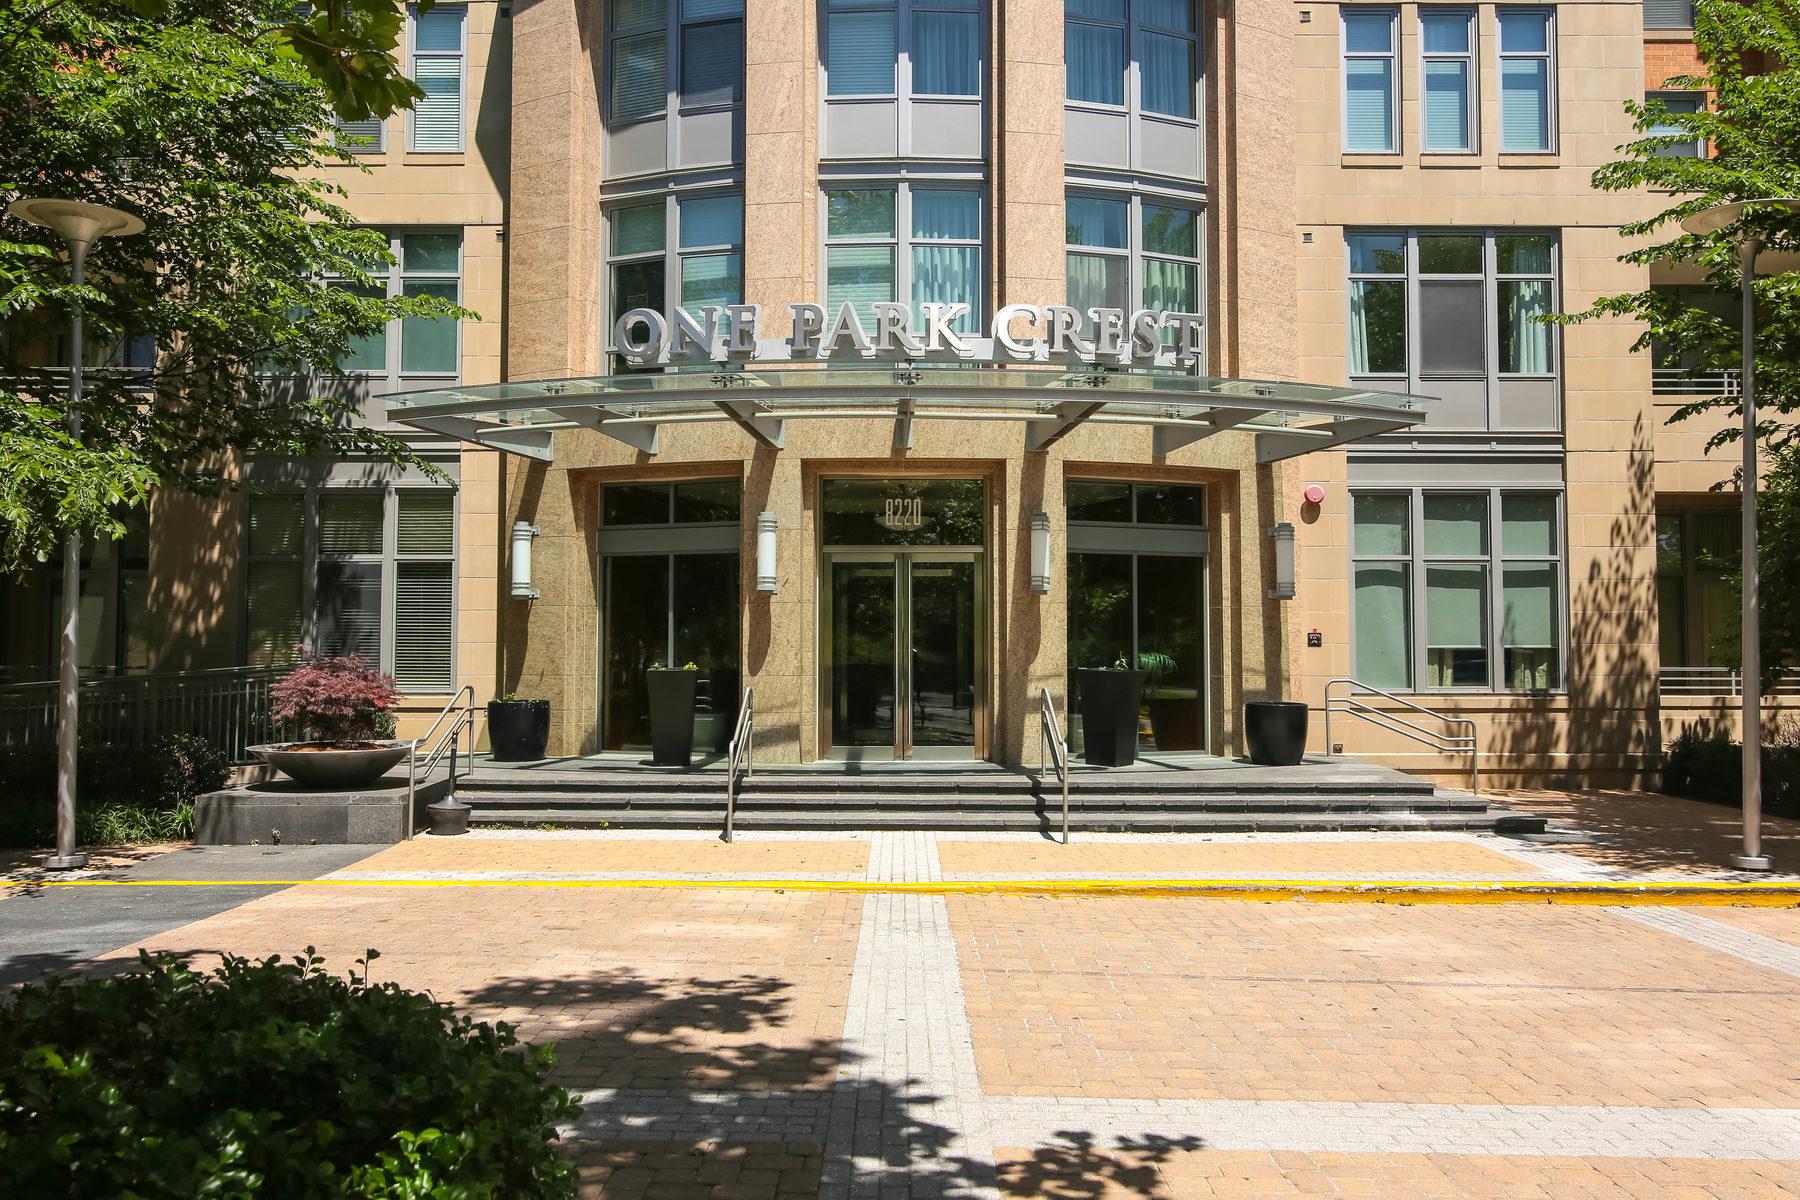 共管物業 為 出售 在 8220 Crestwood Heights Drive 1415, Mclean 8220 Crestwood Heights Dr 1415 McLean, 弗吉尼亞州, 22102 美國